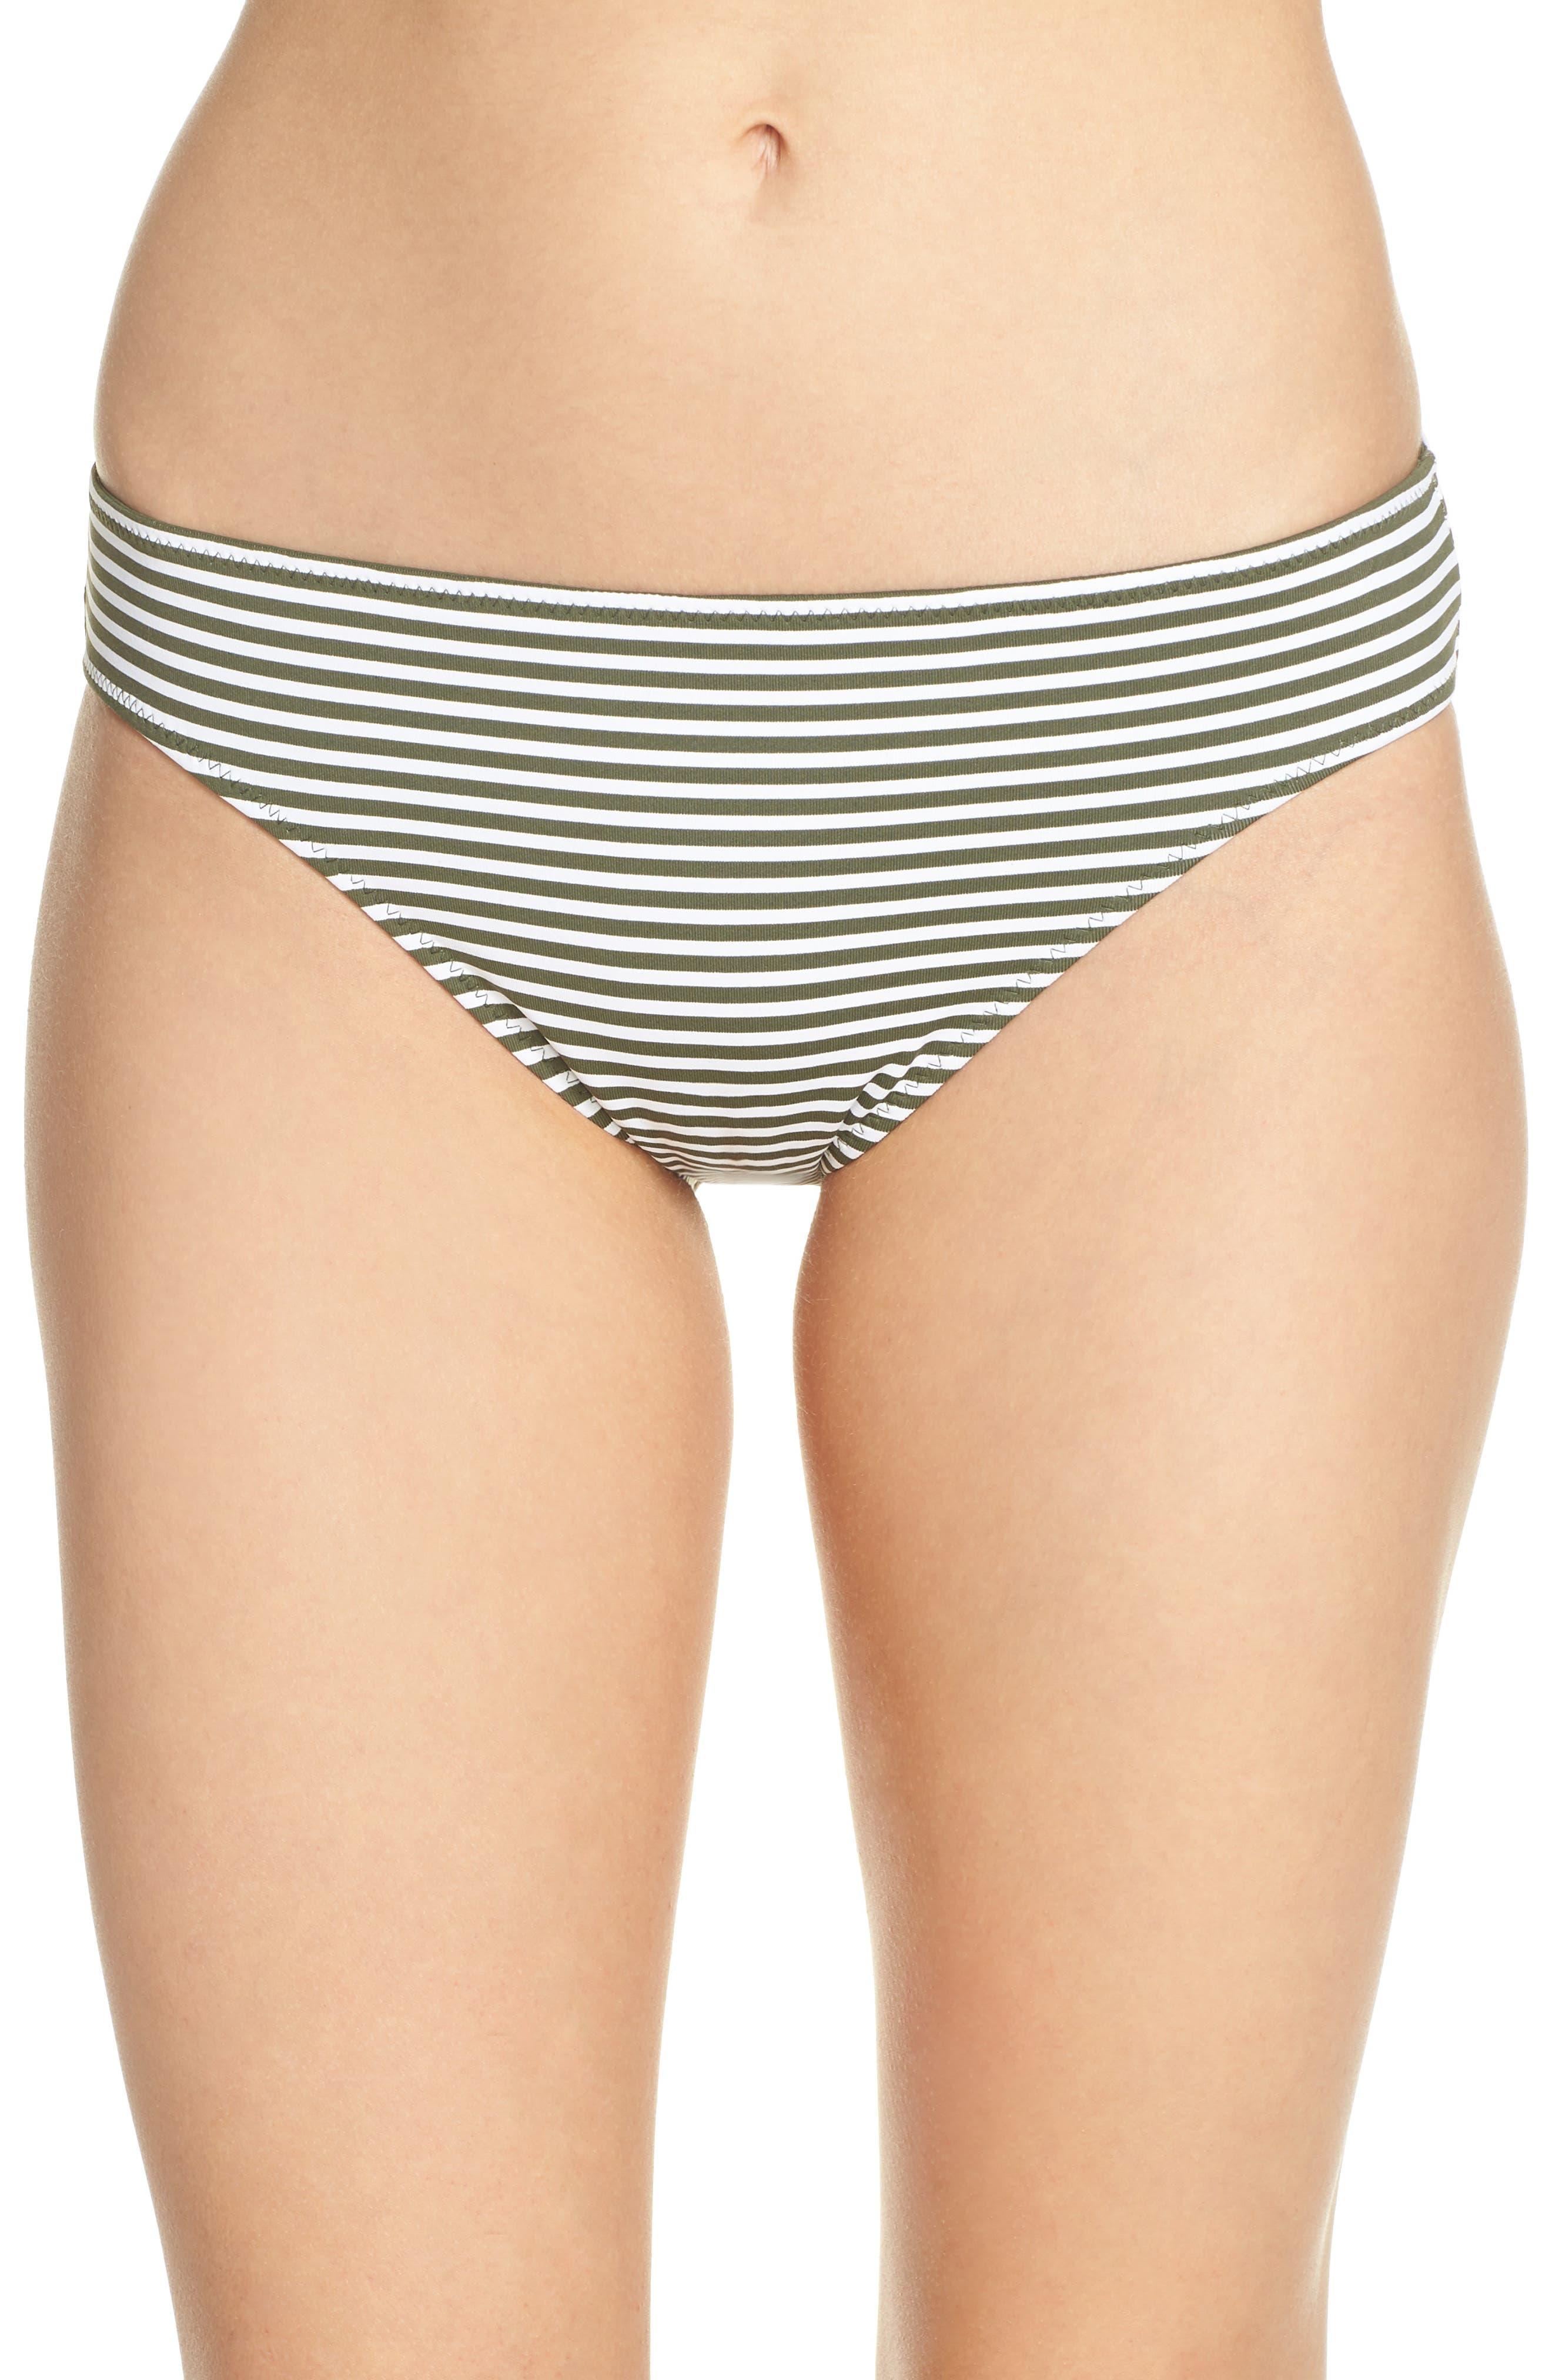 Reversible Hipster Bikini Bottoms,                             Main thumbnail 1, color,                             DARK TEA LEAF